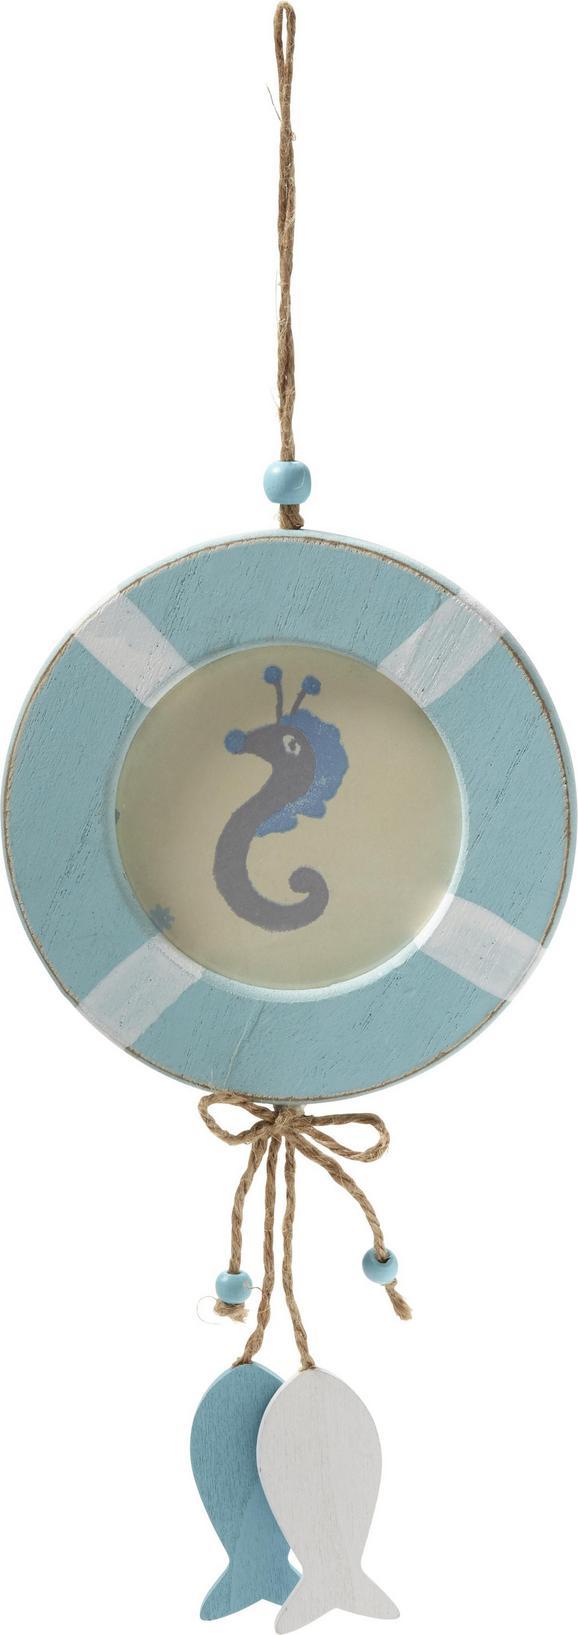 Okvir Za Slike Valentin - svetlo modra, Trendi, steklo/les (12/23/1cm)